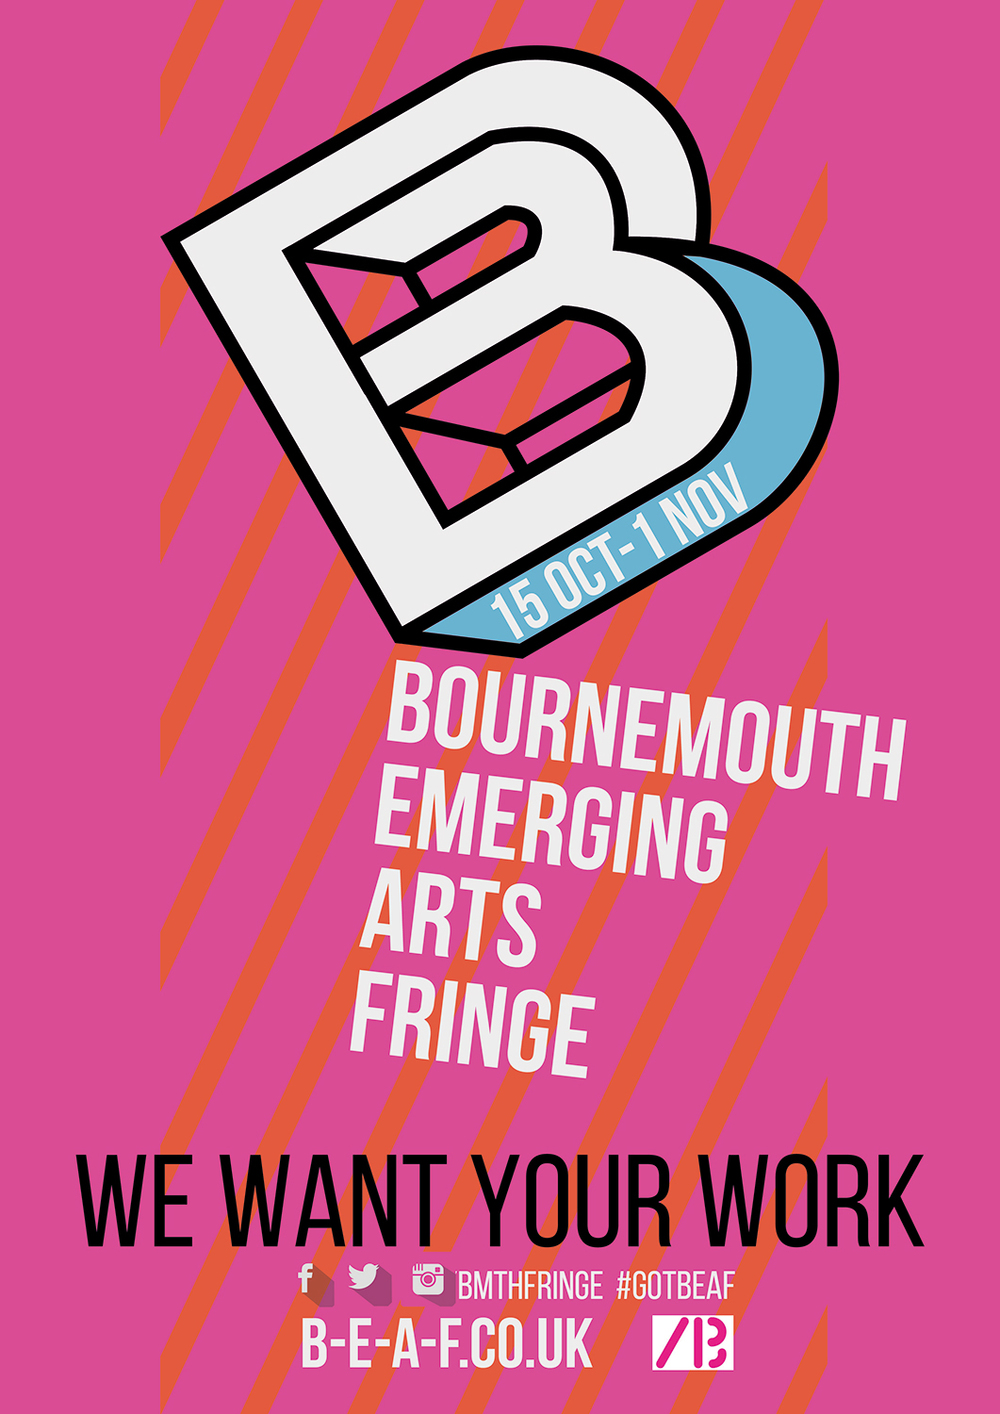 Branding and logo design. Promotional poster for Bournemouth Emerging Arts Fringe festival, 2015.